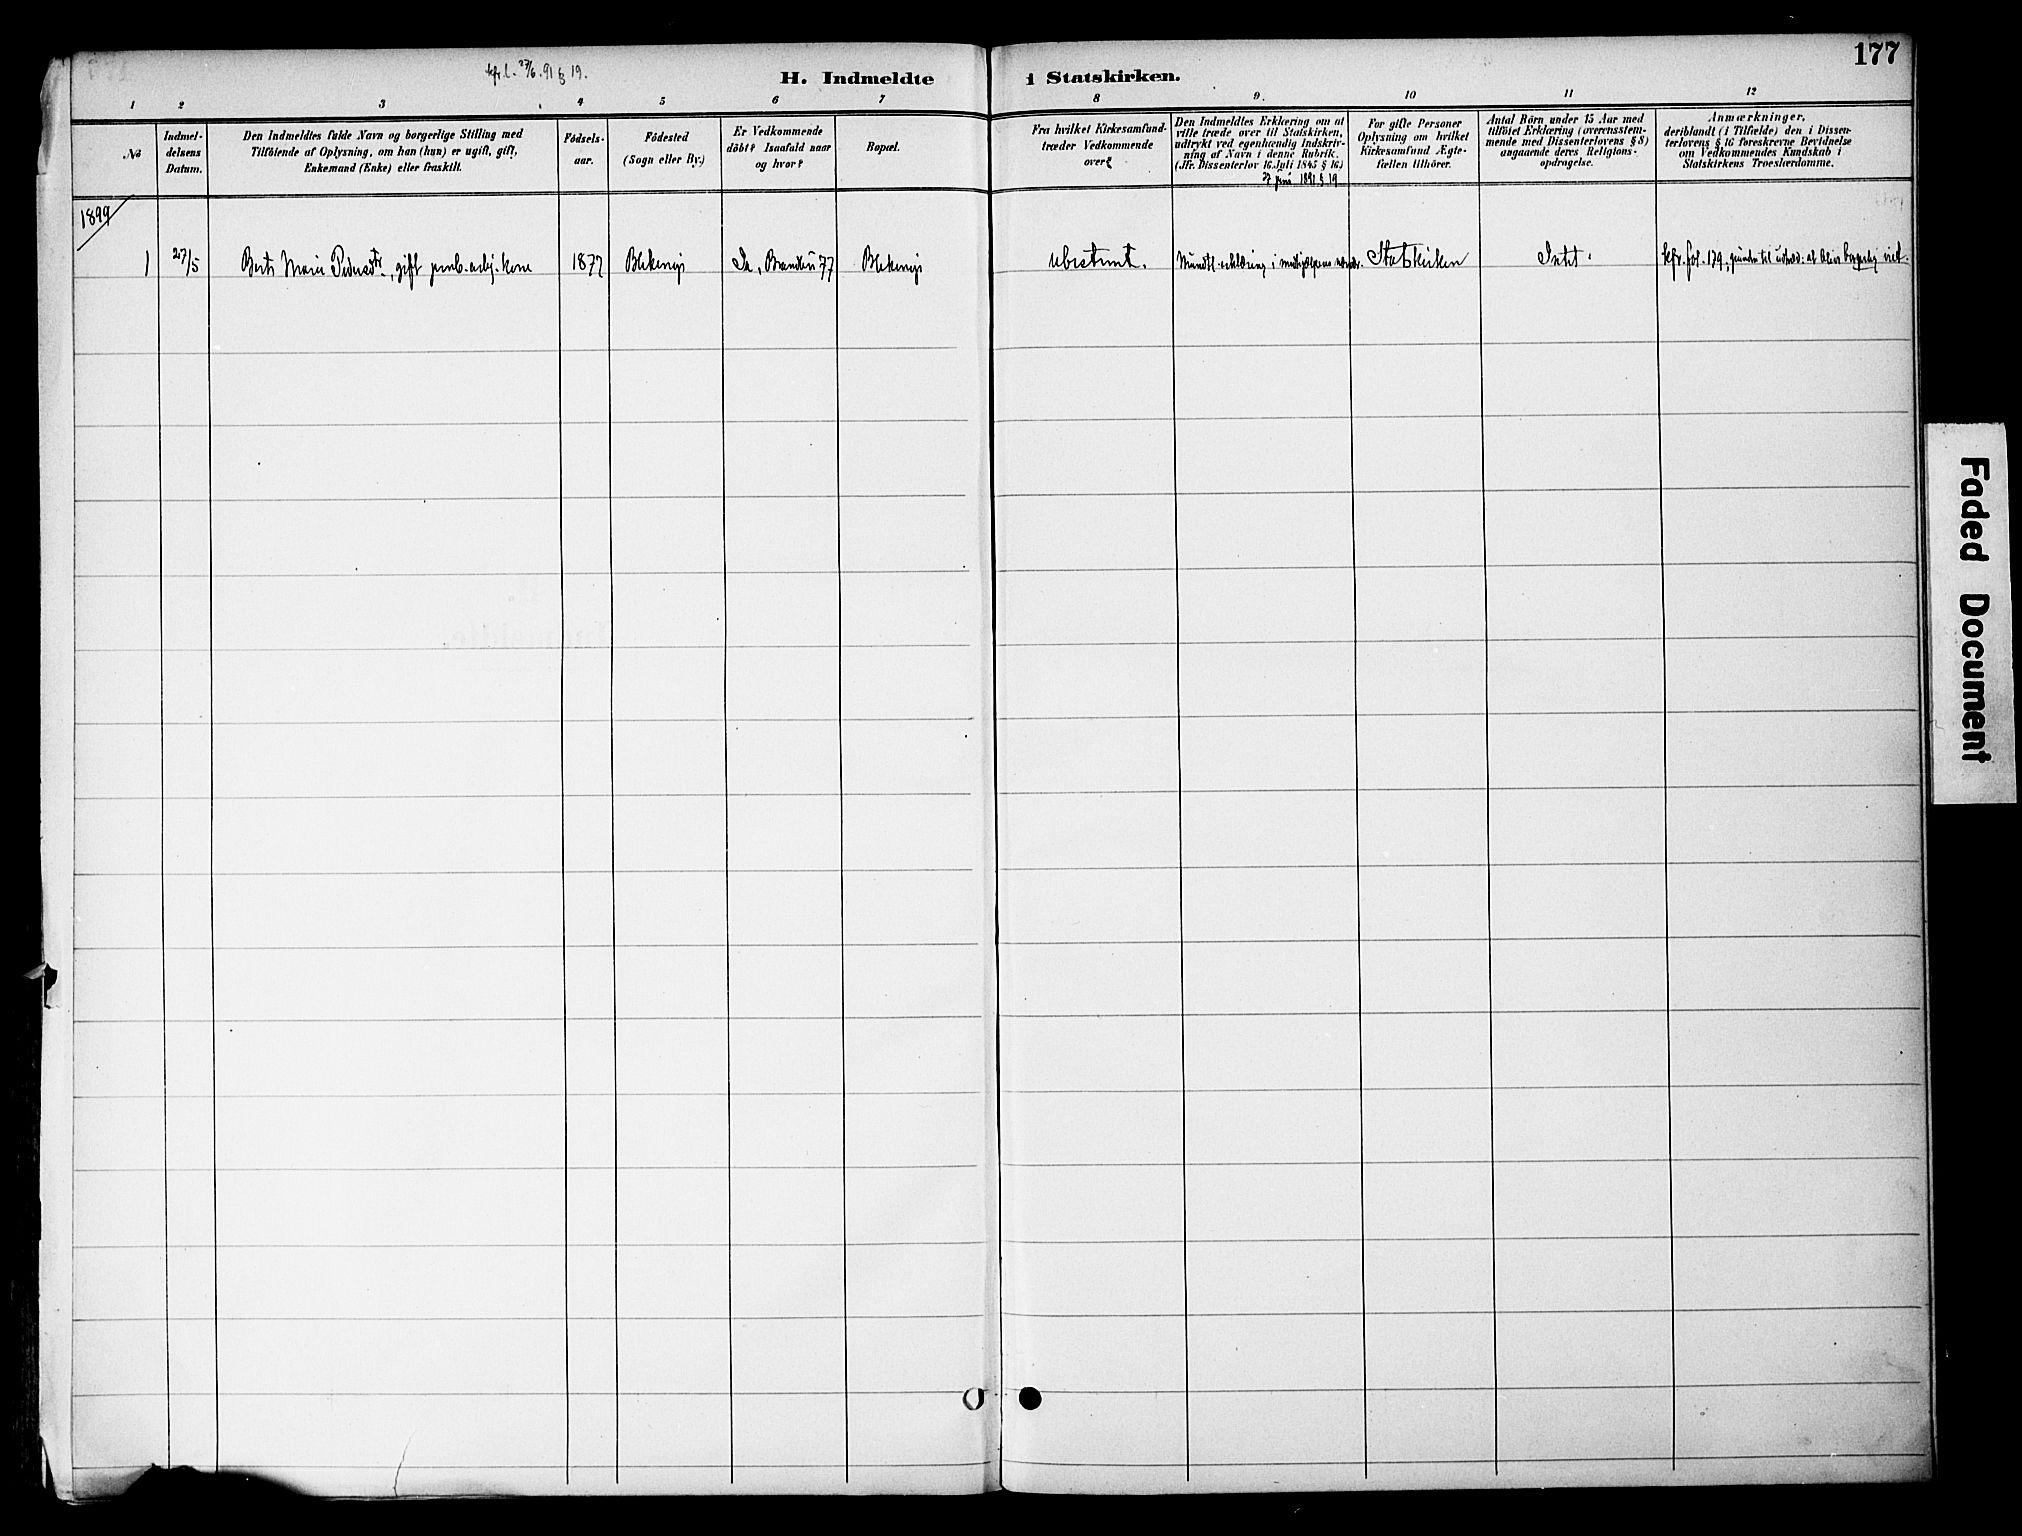 SAH, Gran prestekontor, Ministerialbok nr. 20, 1889-1899, s. 177